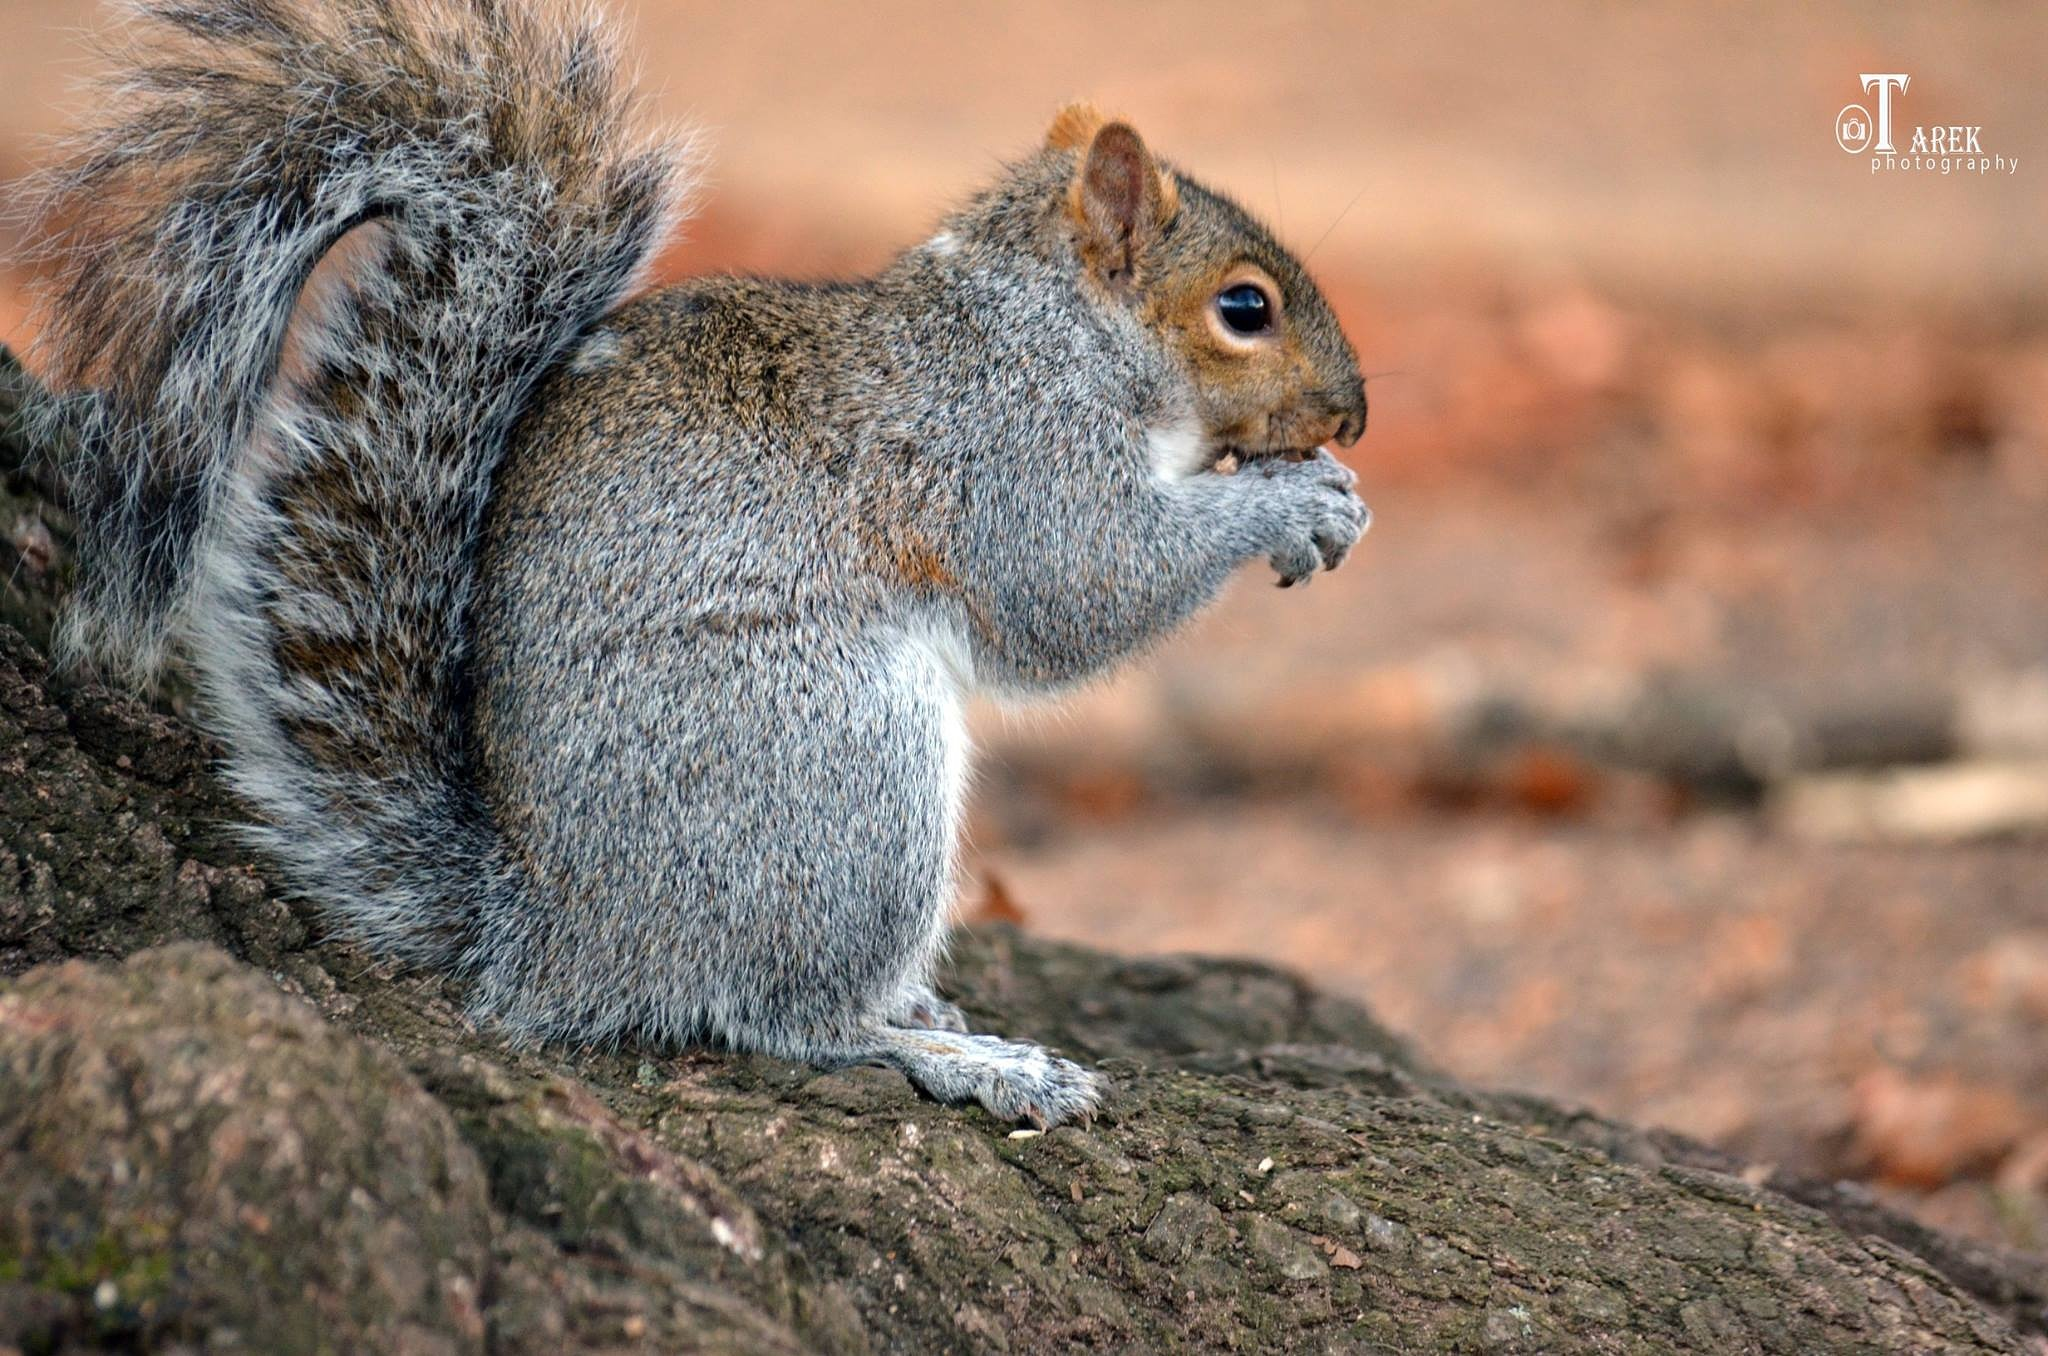 Squirrel by Tarek Ibrahem